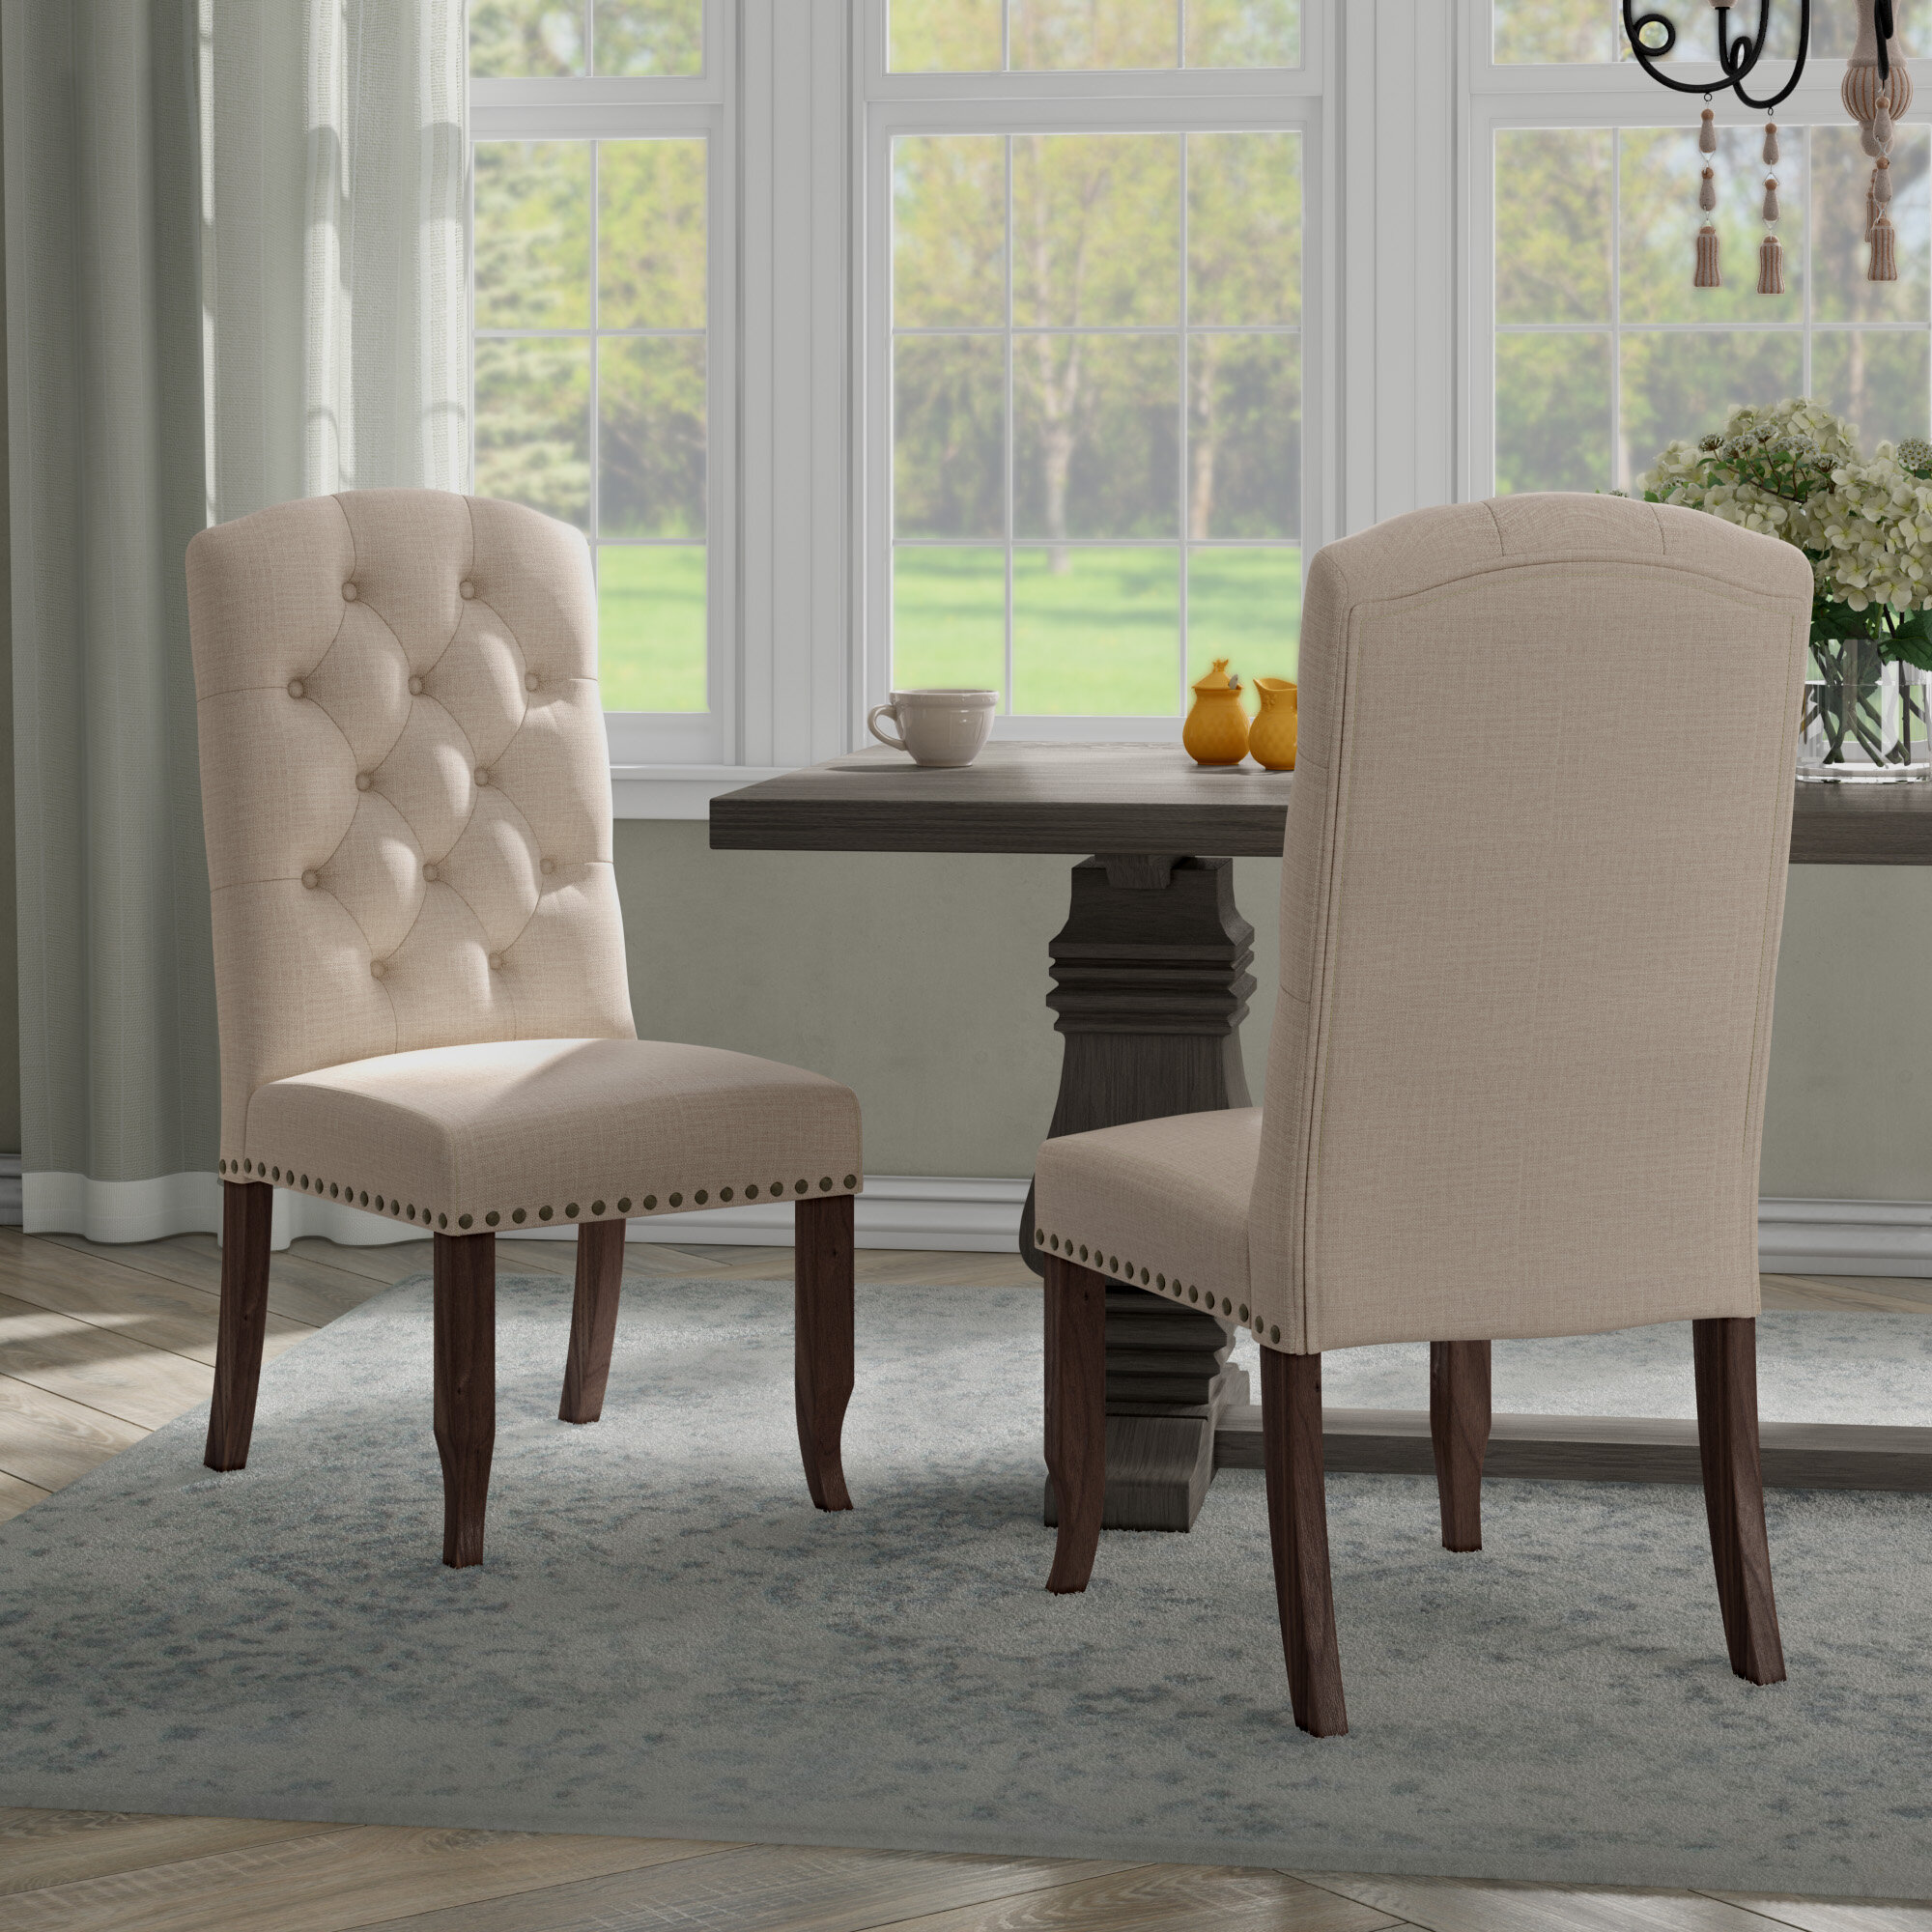 Ophelia Co Burlingame Side Chair Reviews Wayfair